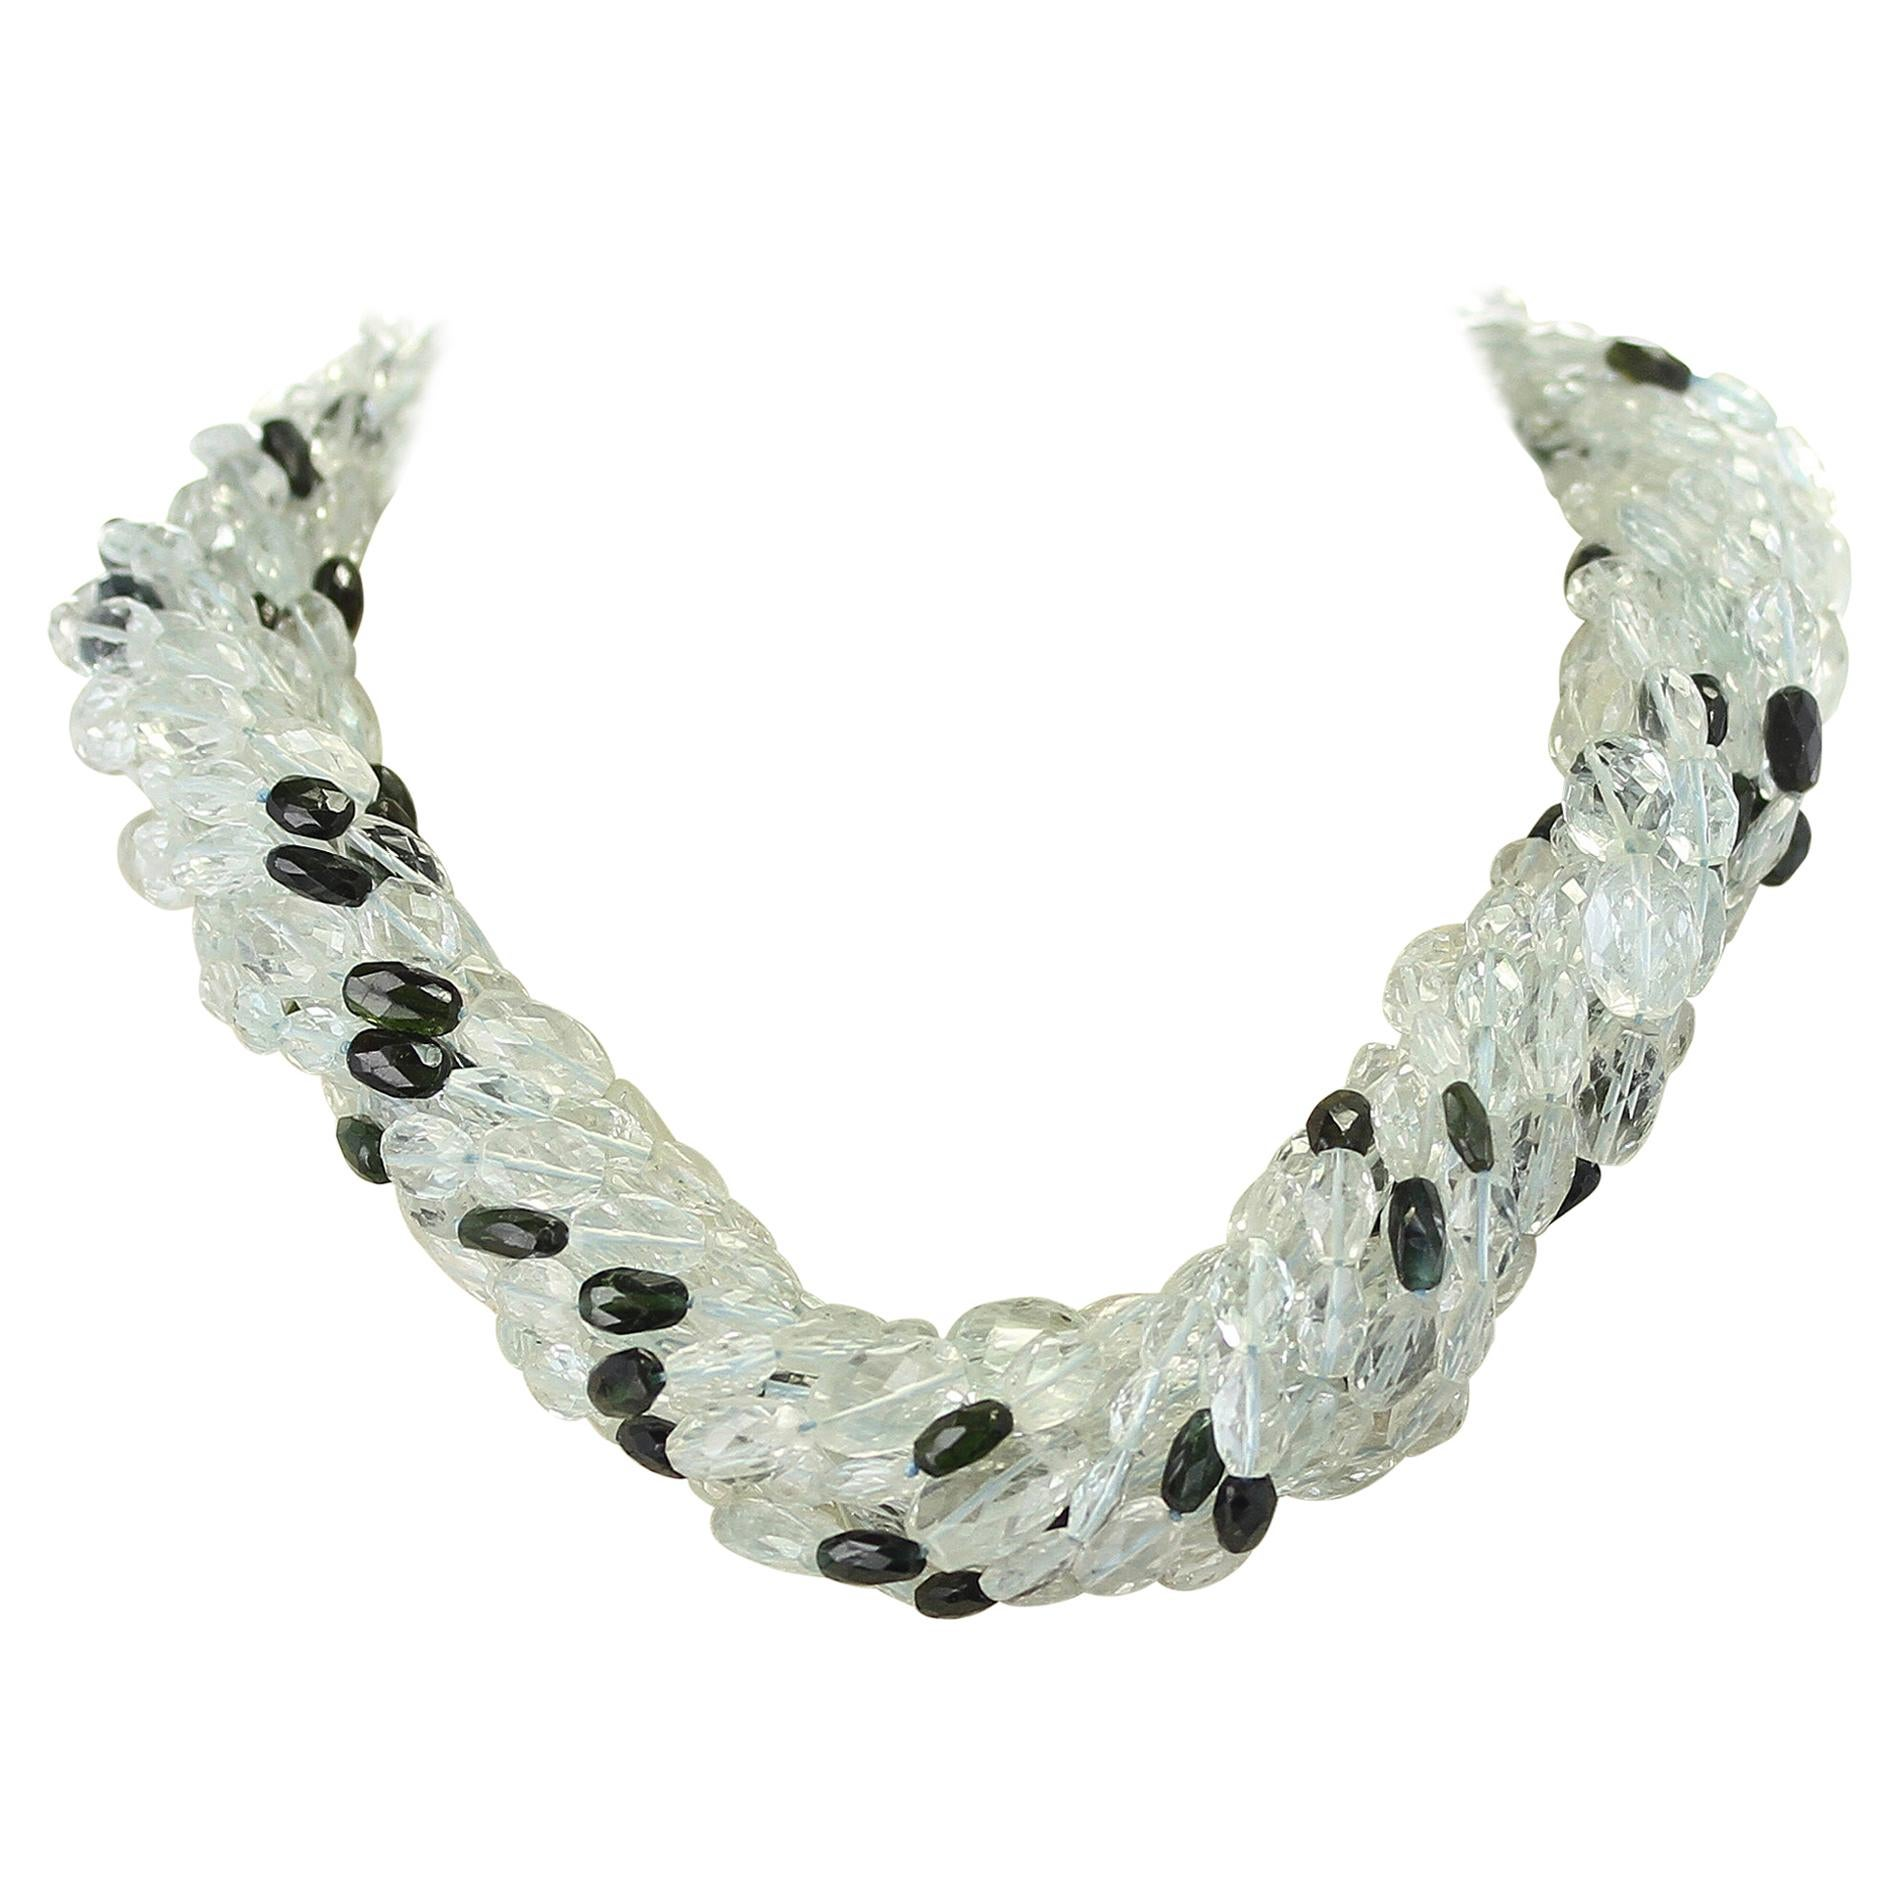 Genuine & Natural Aquamarine Faceted Tumbled Bead & Tourmaline Choker Necklace